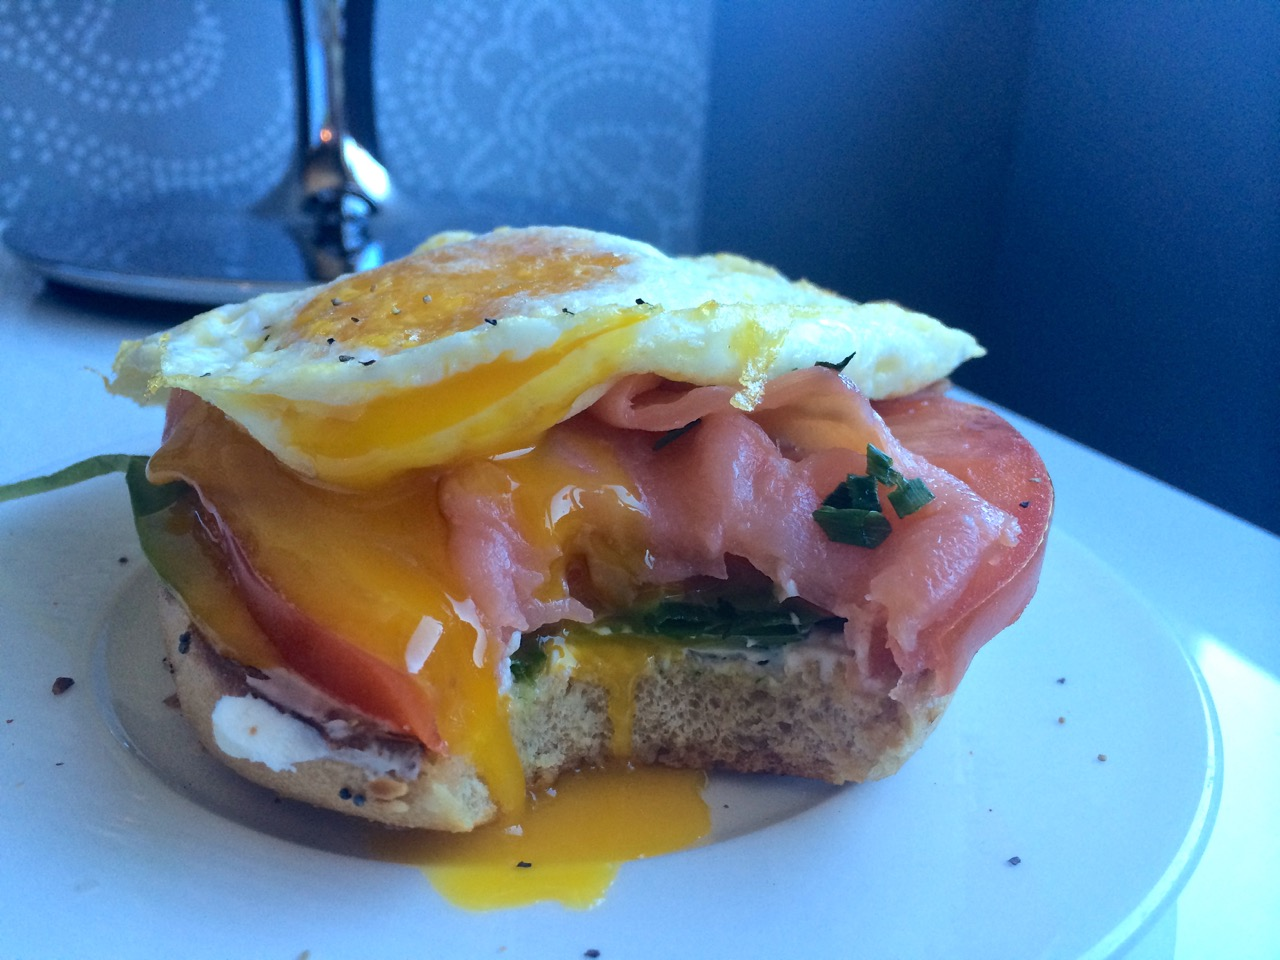 Runny Egg Bagel Sandwich